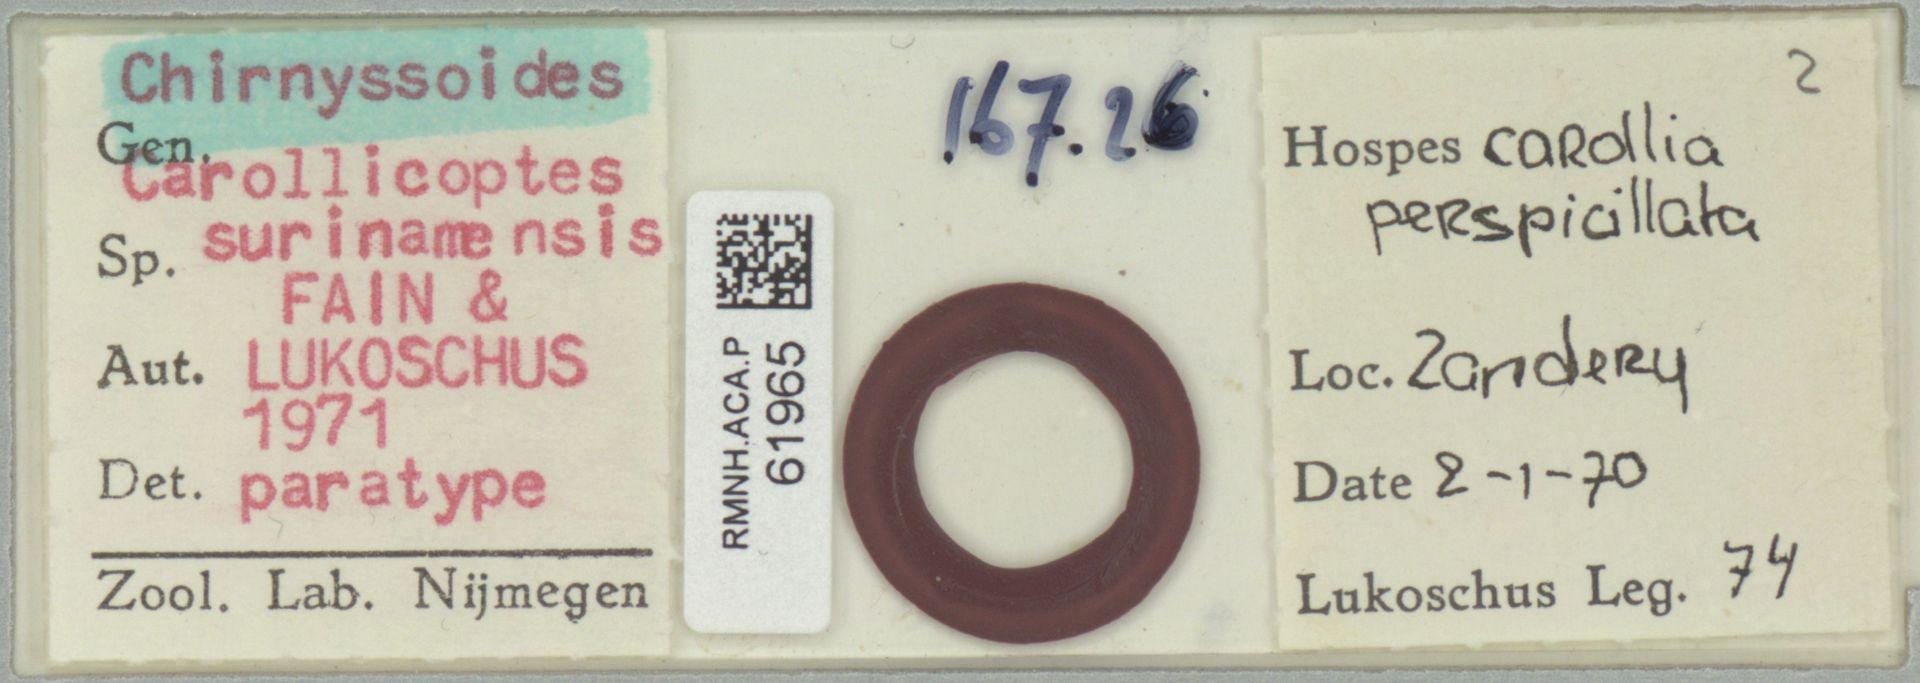 RMNH.ACA.P.61965 | Chirnyssoides (Carrolicoptes) surinamensis Fain & Lukoschus 1971